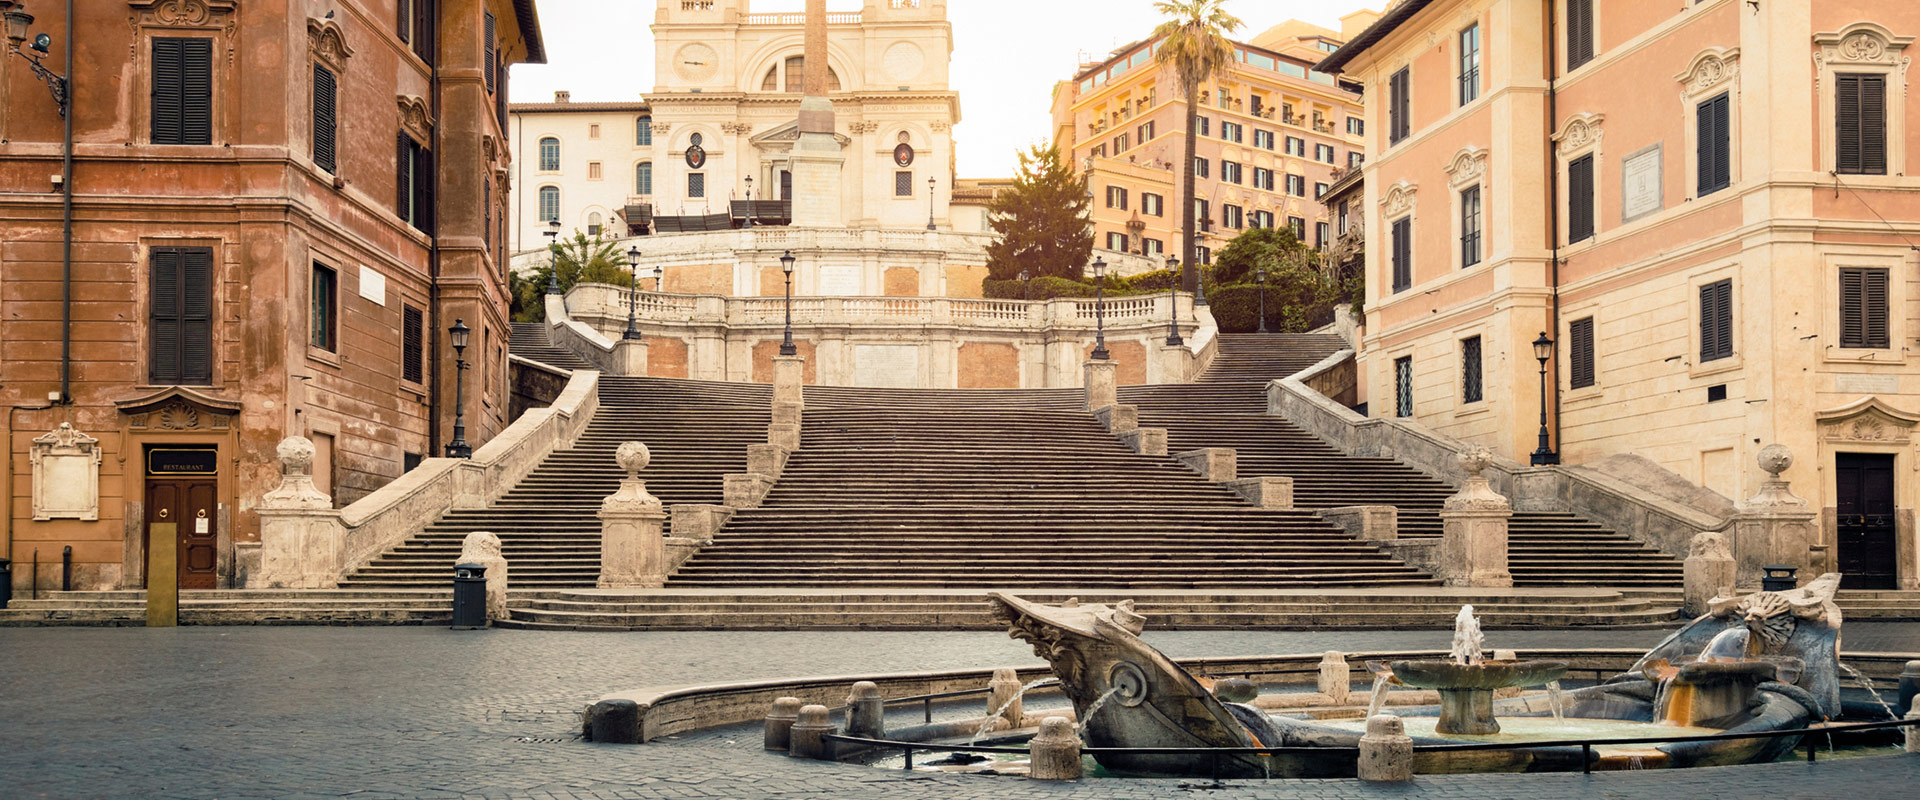 Piazza de Spagna, Roma